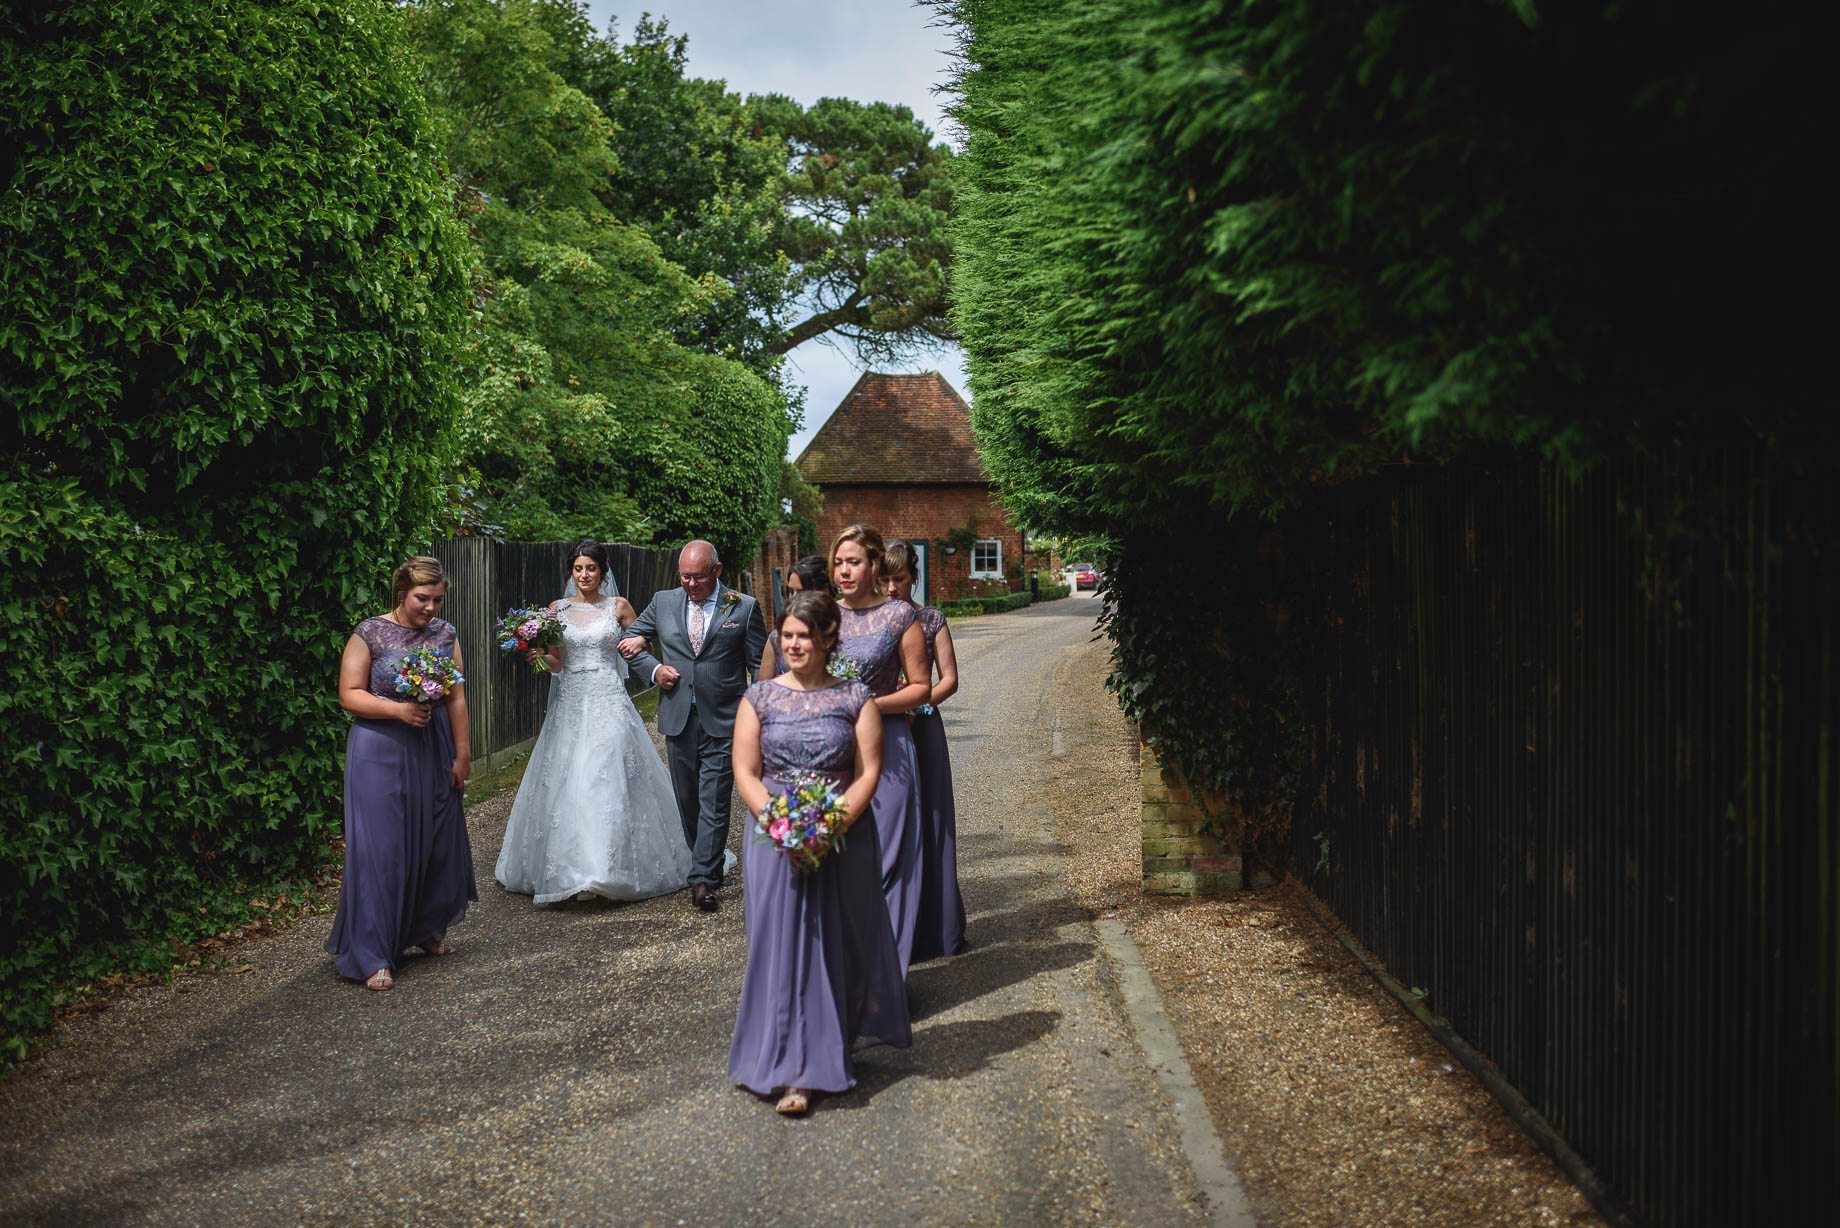 Gaynes Park wedding photography - Guy Collier Photography - Rachel and Jon (59 of 169)